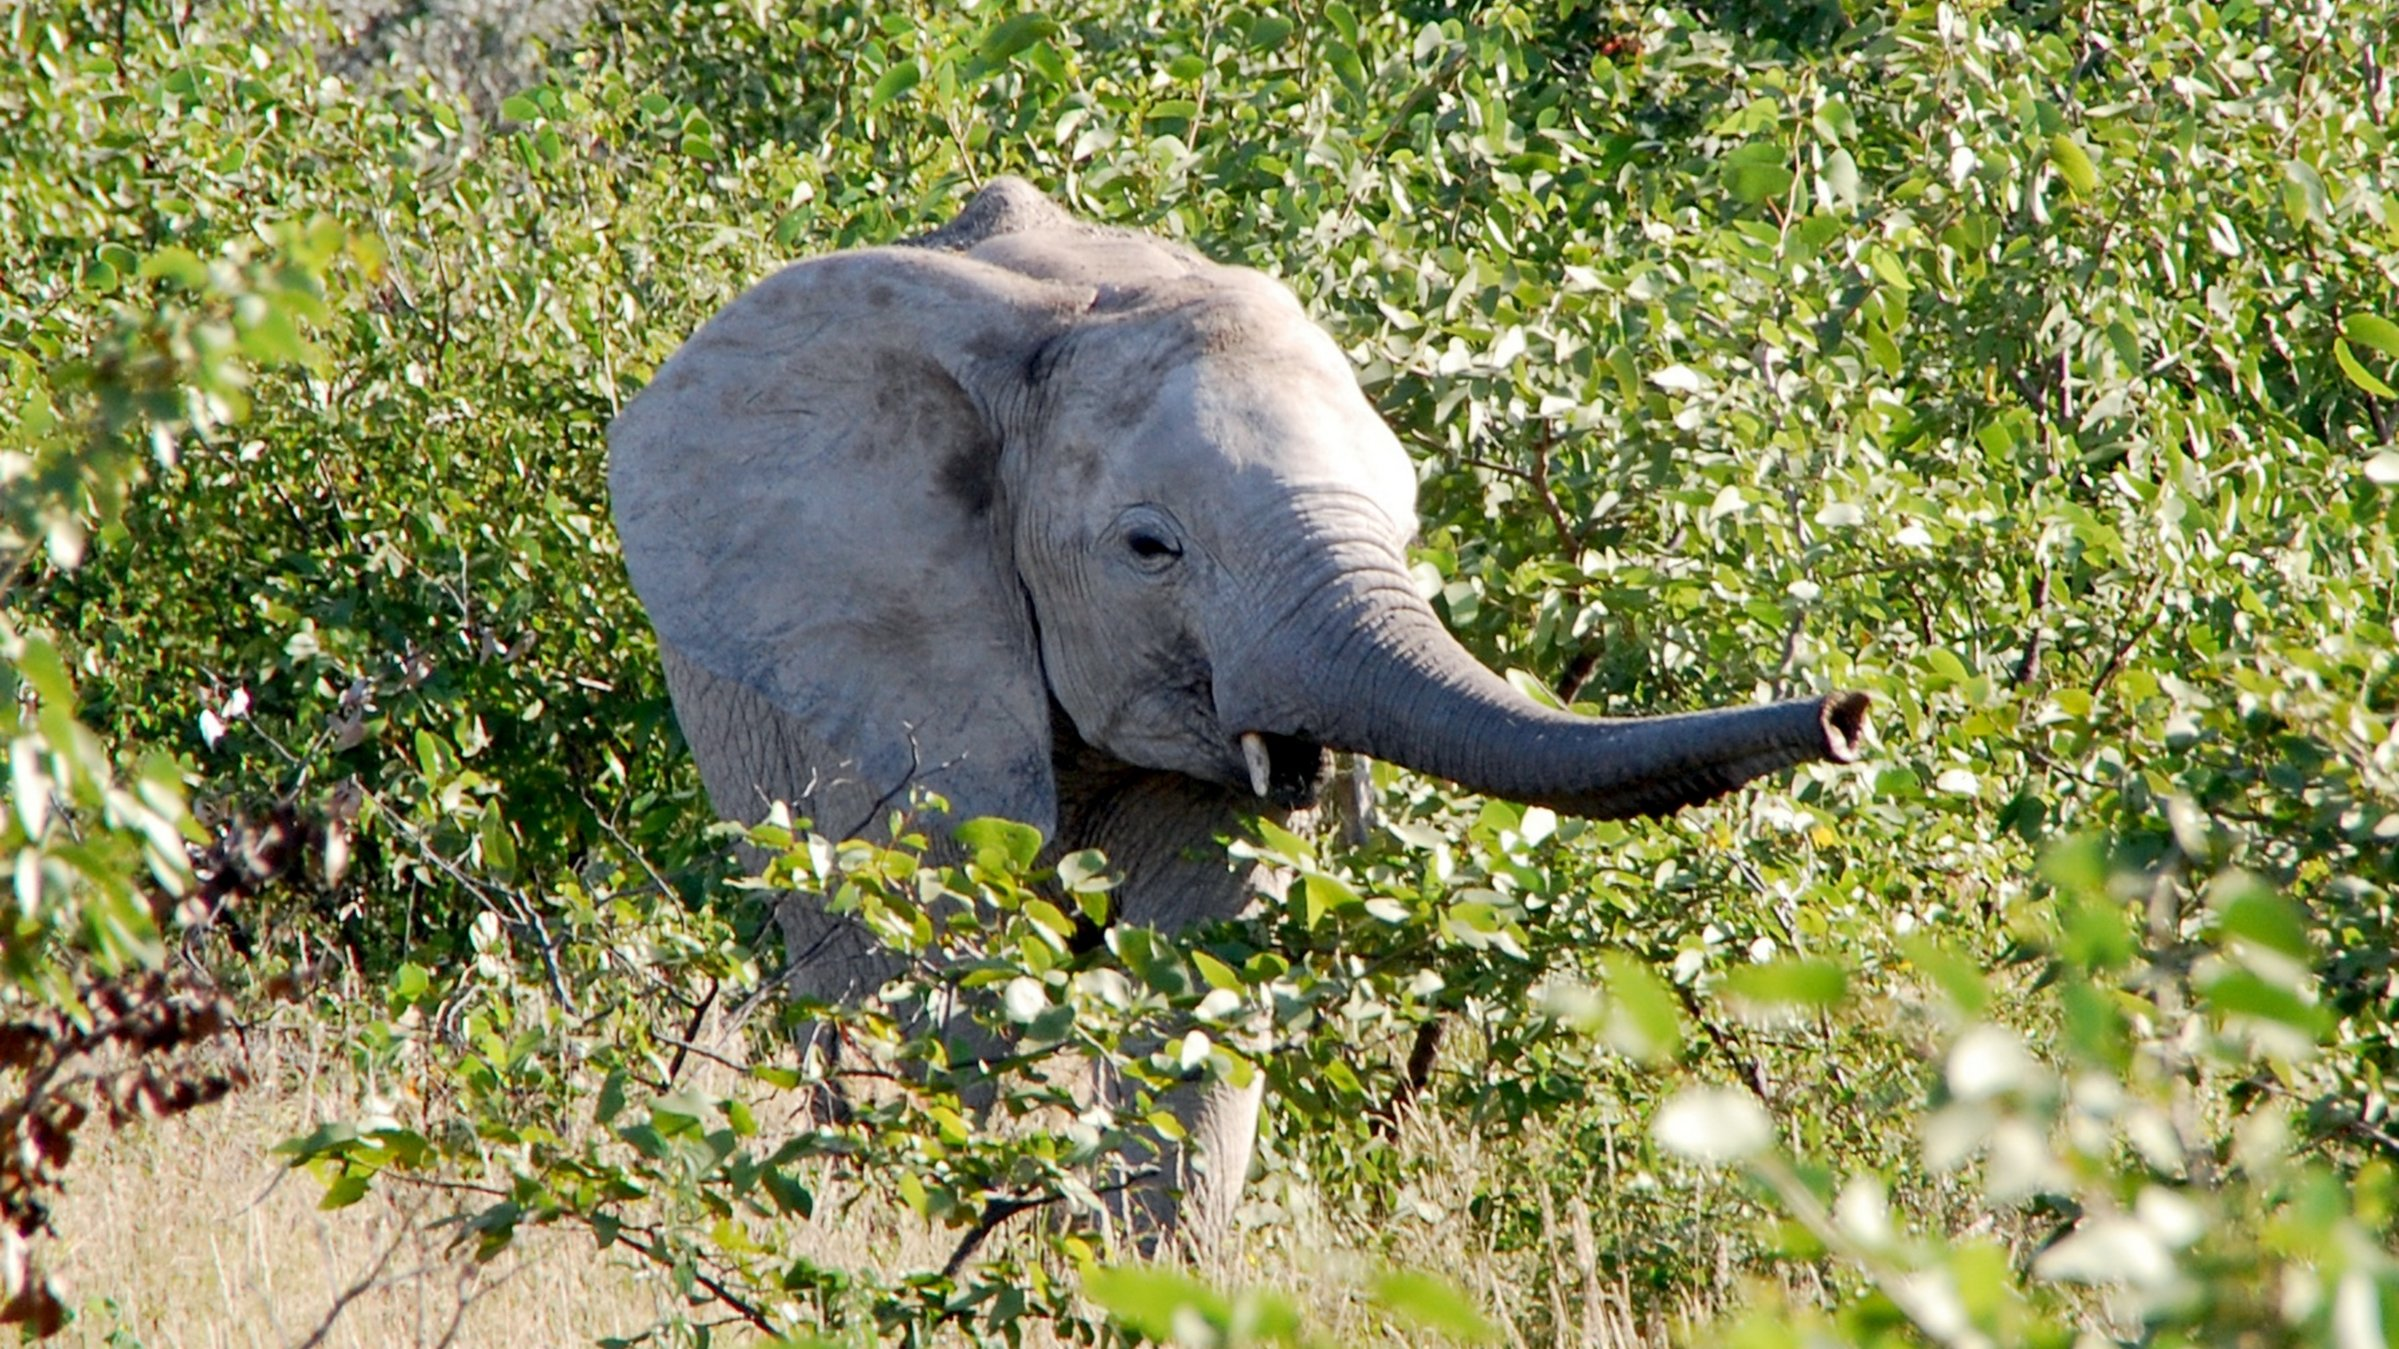 3-Day Etosha Getaway - Namibia Itinerary